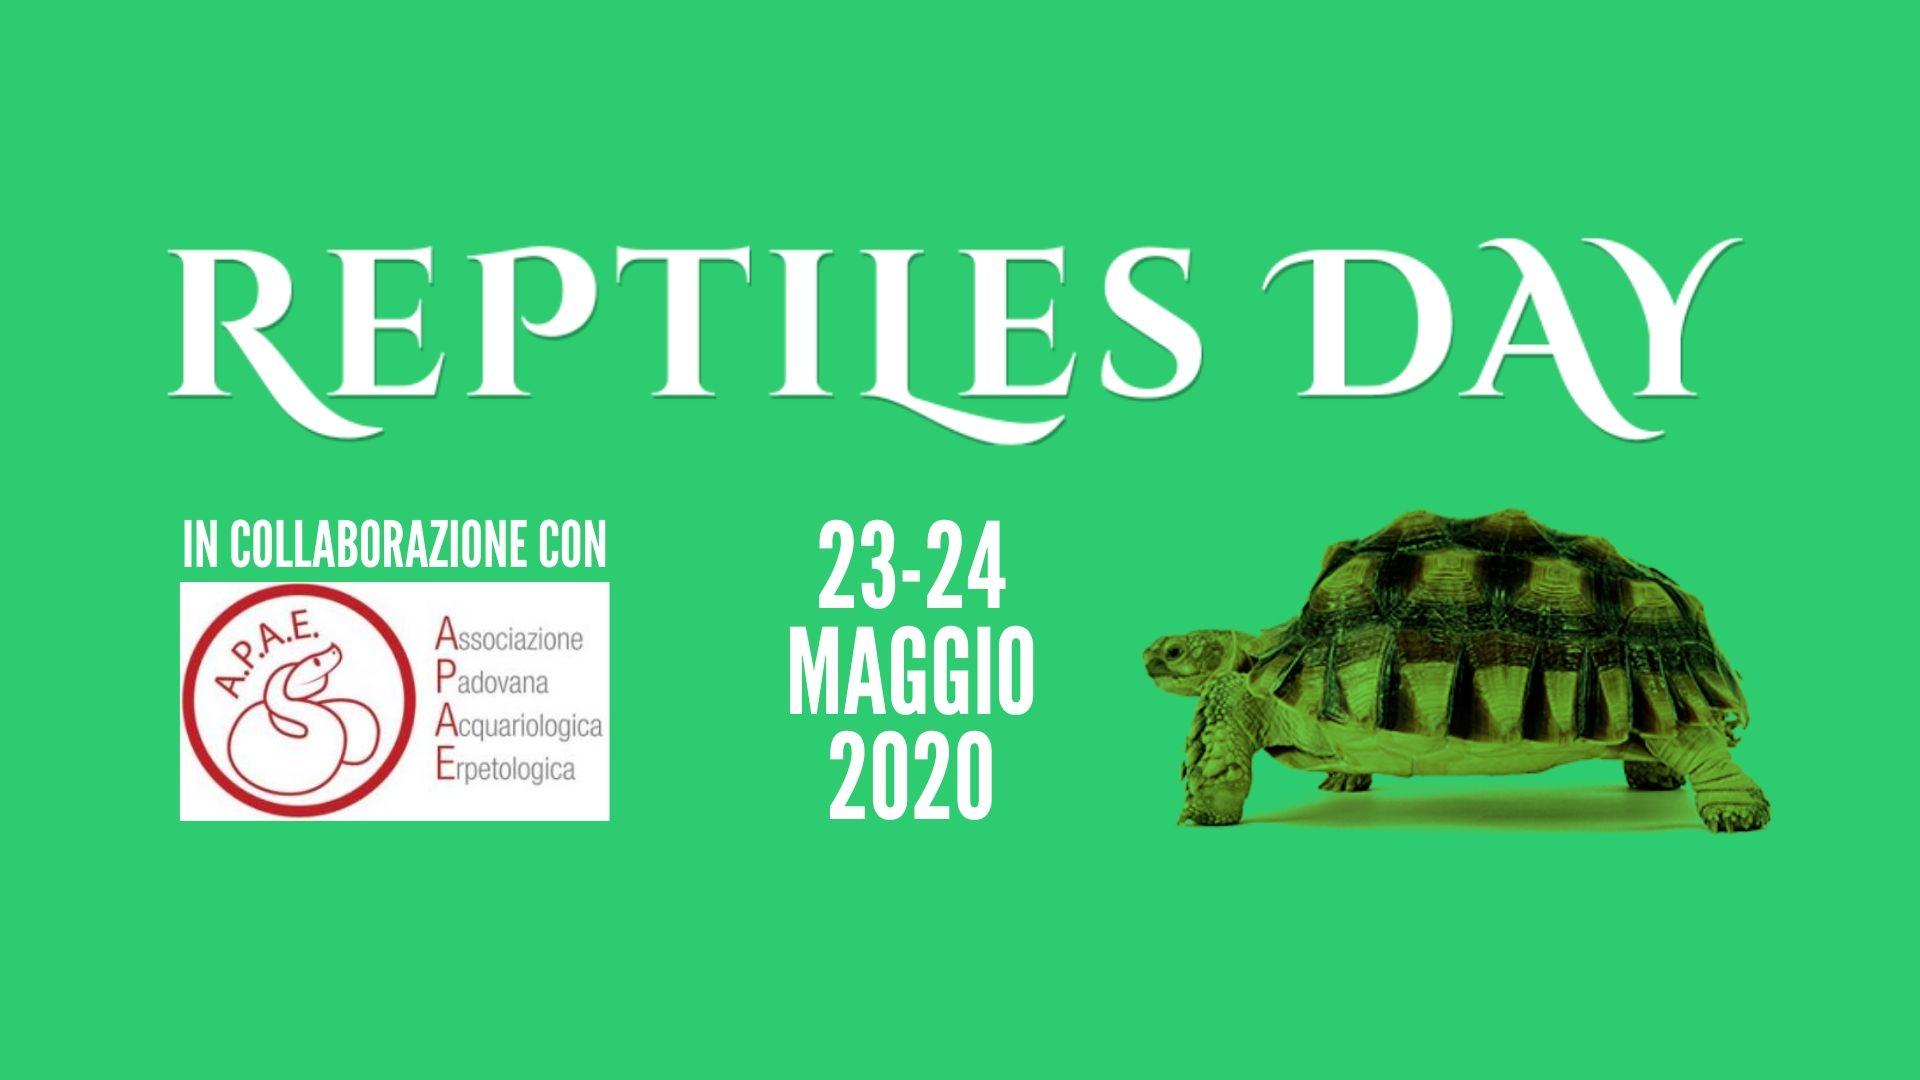 banner reptiles day longarone fiere dolomiti loveitaliafun